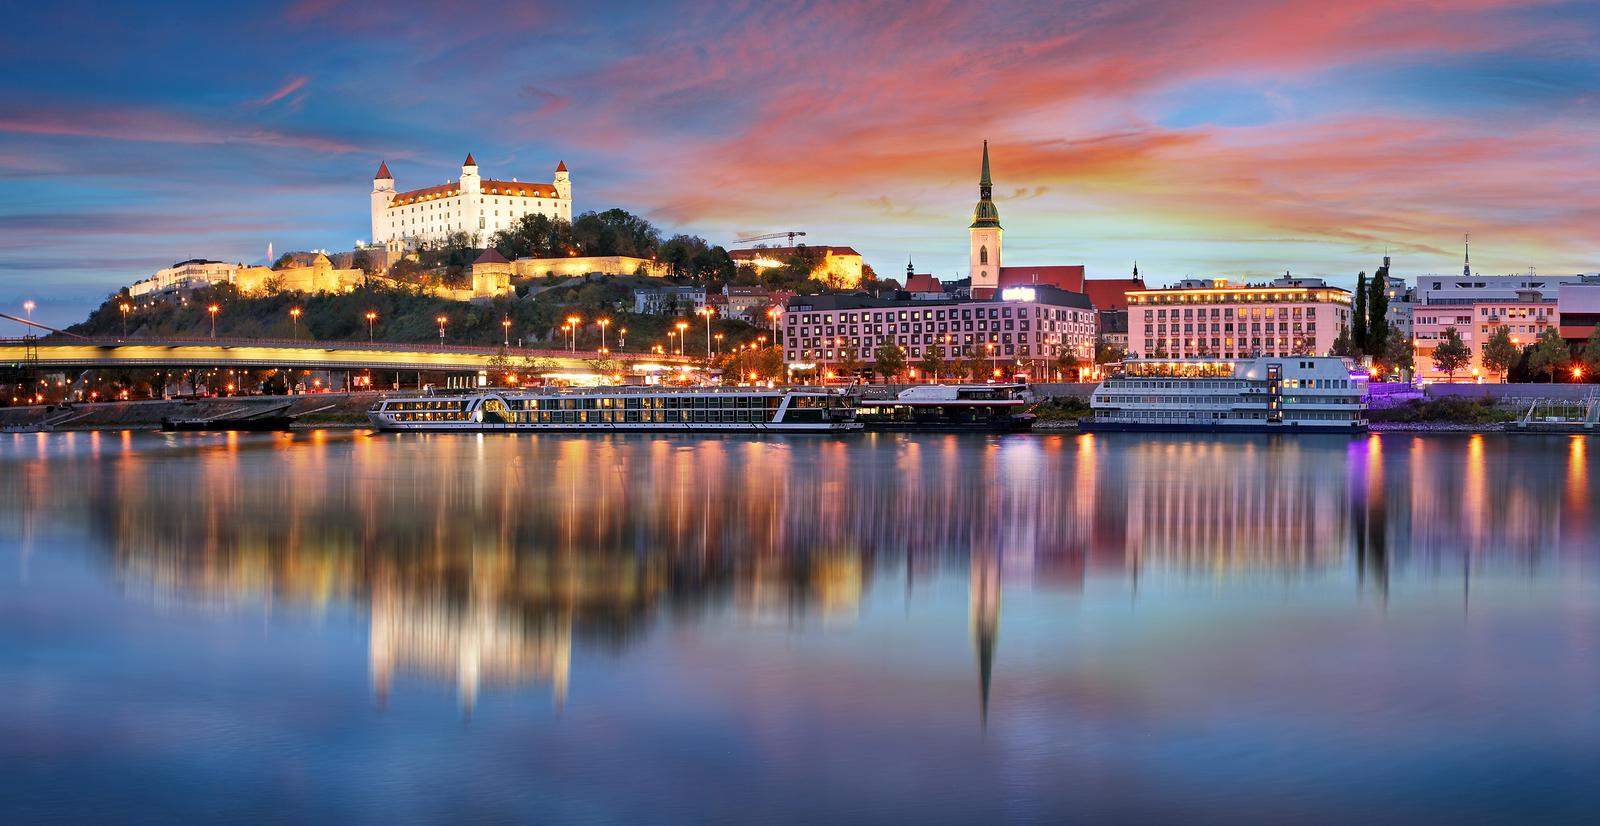 Historic Old Town of Bratislava